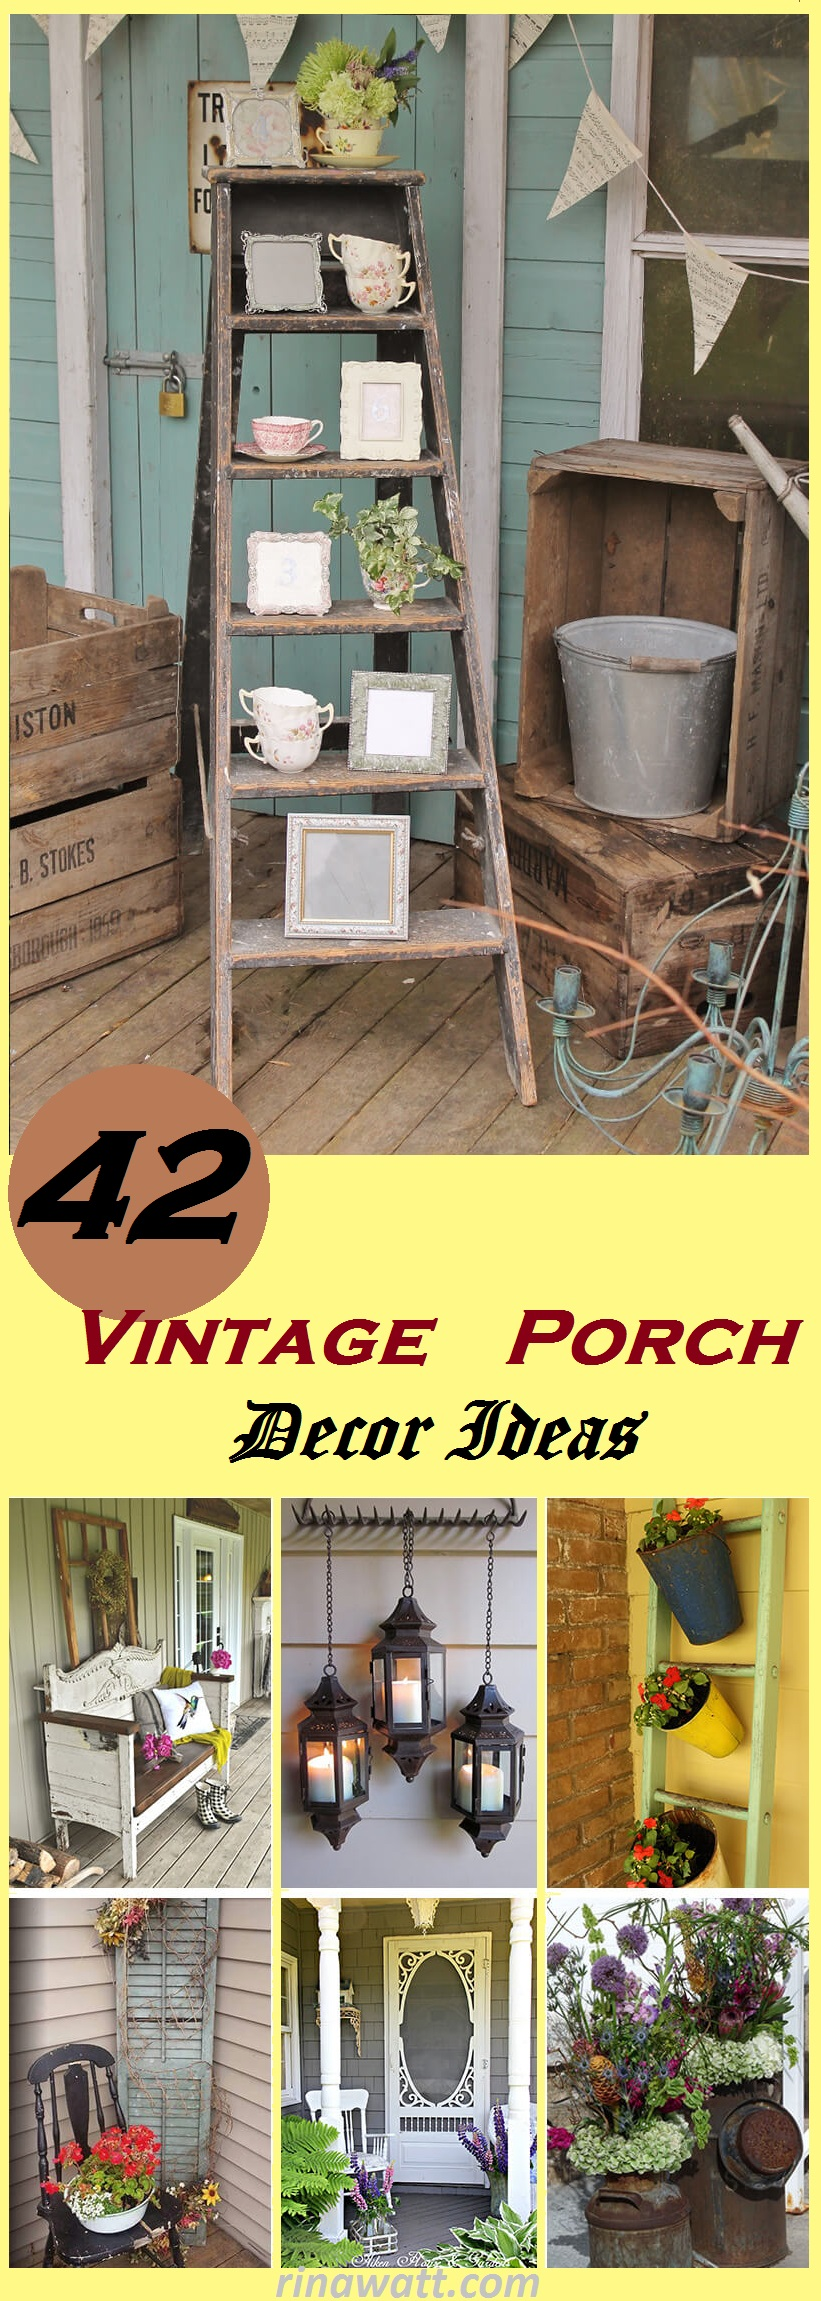 porch decorating, porch decor ideas, rustic spring porch decor ideas, vintage porch ideas